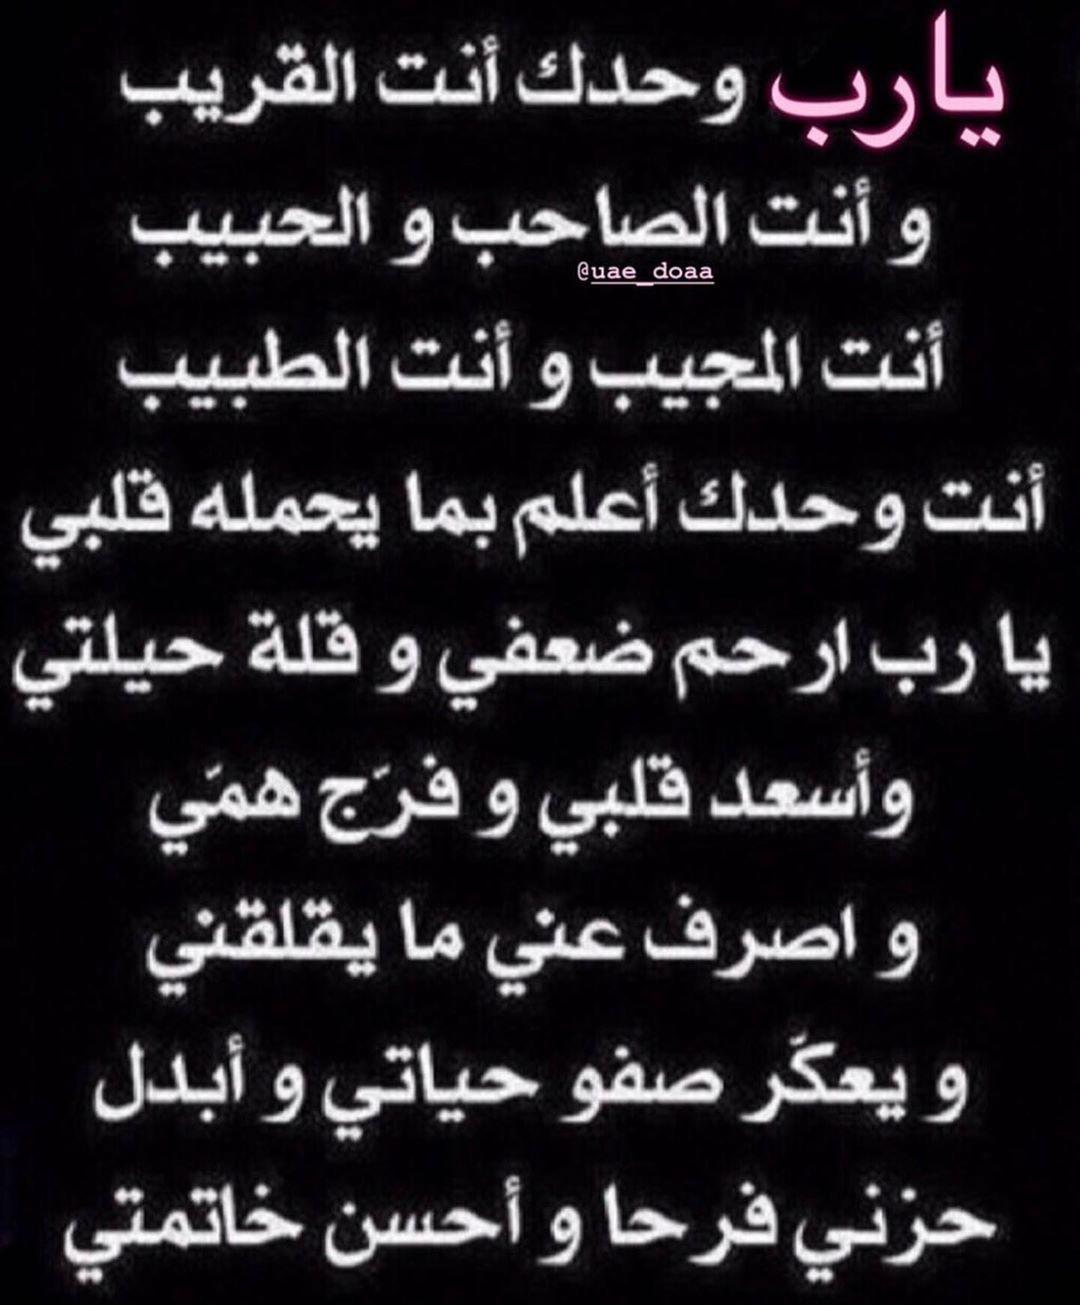 Twitter Ad3yaaaa On Instagram الوتر اللهم اهد نا فيم ن هديت وعافنا فيمن عافيت وتولنا فيمن توليت Islamic Phrases Islamic Love Quotes Islamic Quotes